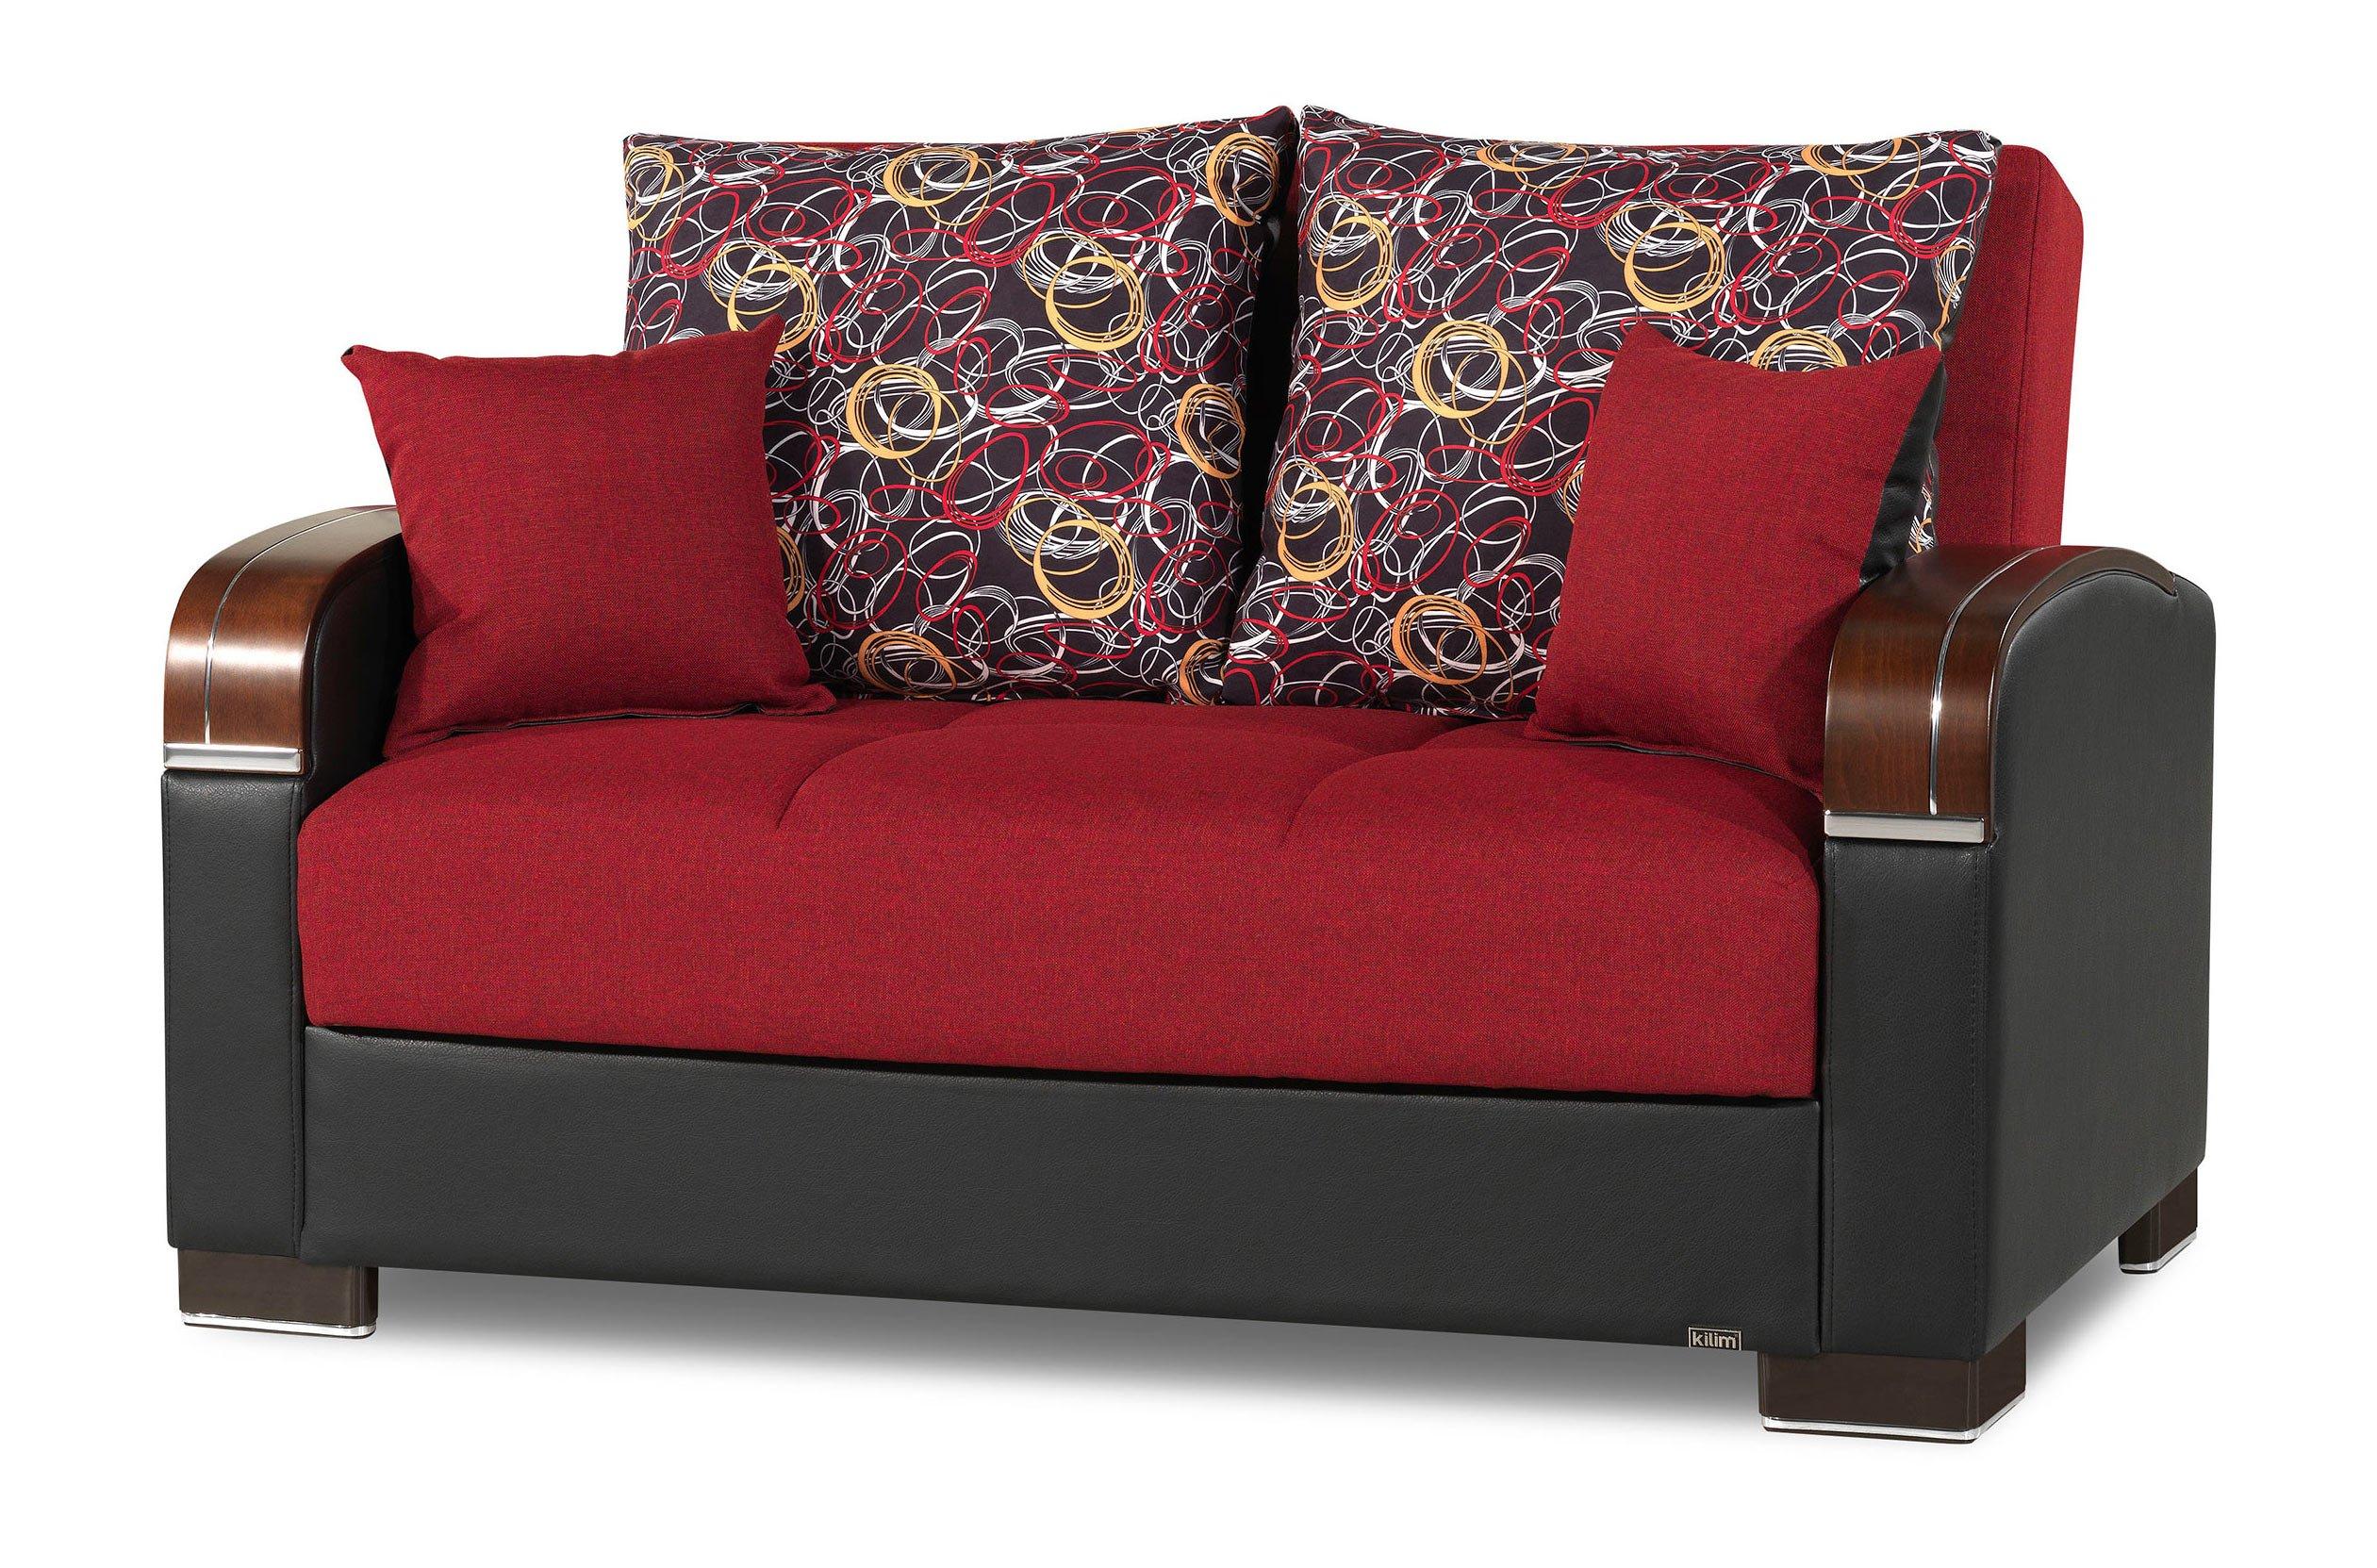 Wondrous Mobimax Red Loveseat By Casamode Inzonedesignstudio Interior Chair Design Inzonedesignstudiocom